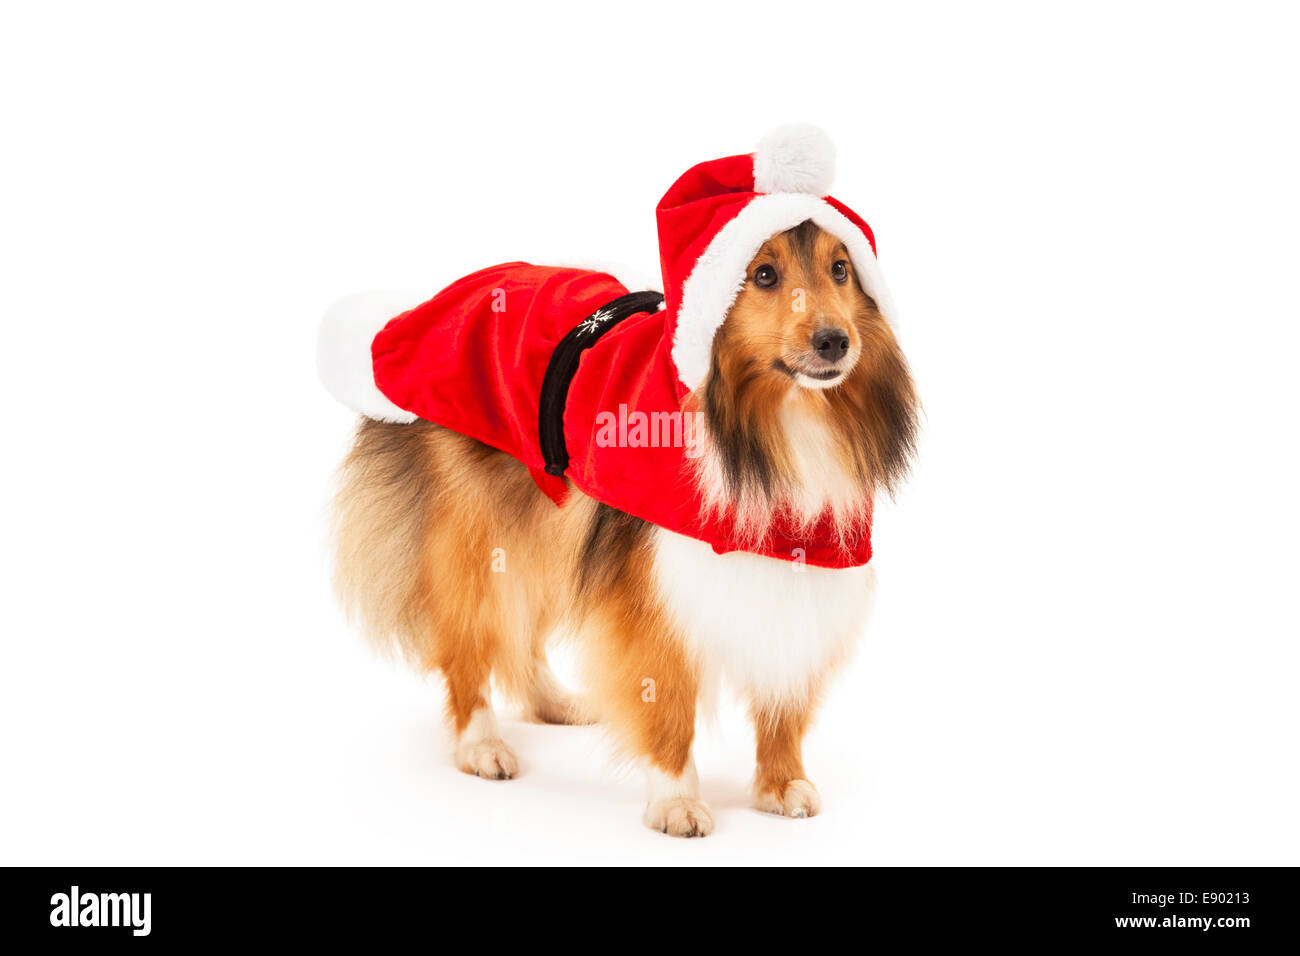 Shetland sheepdog in santa dress over white background - Stock Image